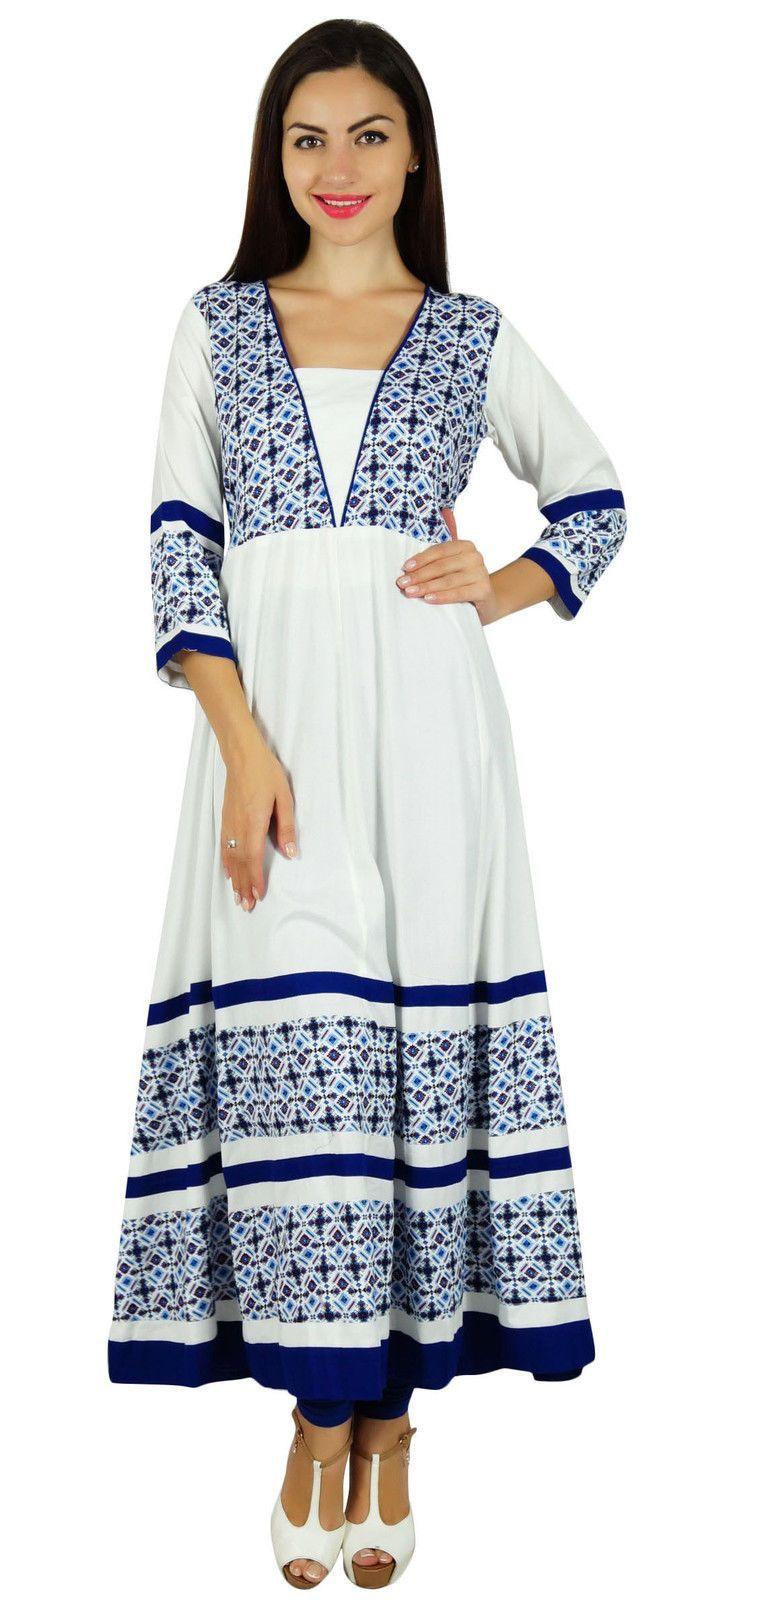 61b3dc4baff5d3 Bimba Women White Rayon Anarkali Designer Kurta Kurti Casual Tunic 3/4  Sleeve